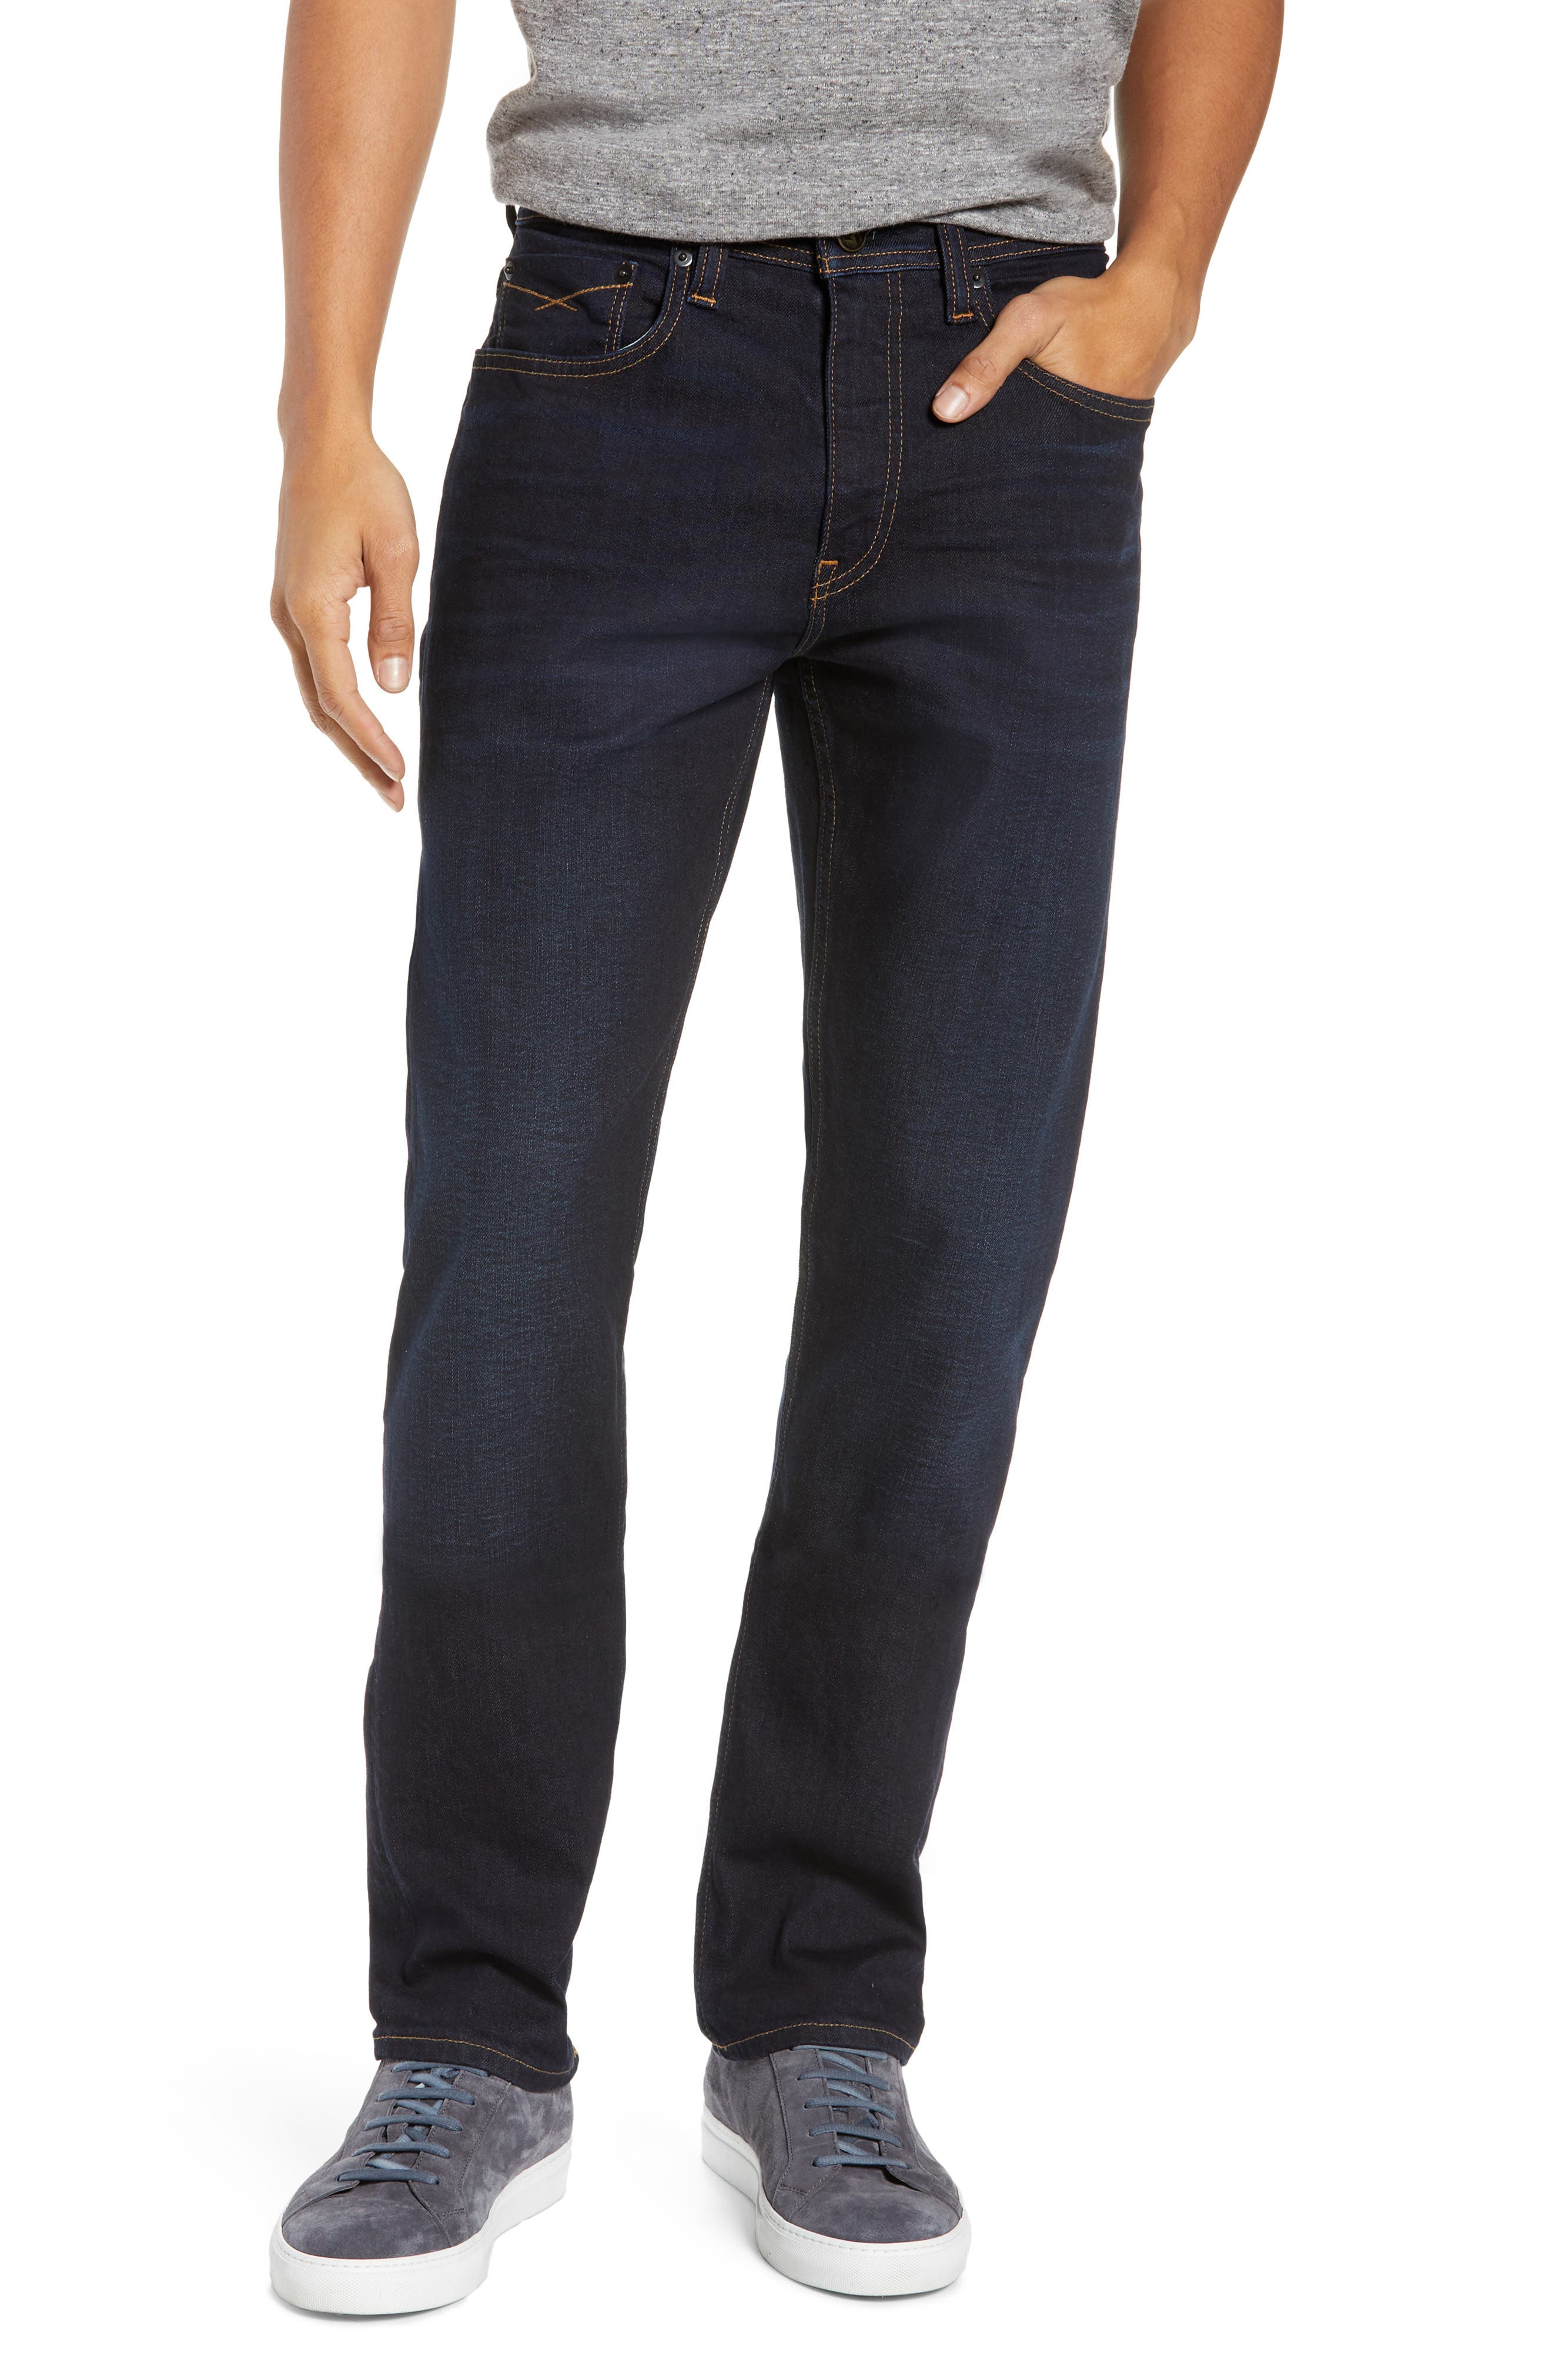 Sharp Slim Fit Jeans,                             Main thumbnail 1, color,                             DARK INDIGO